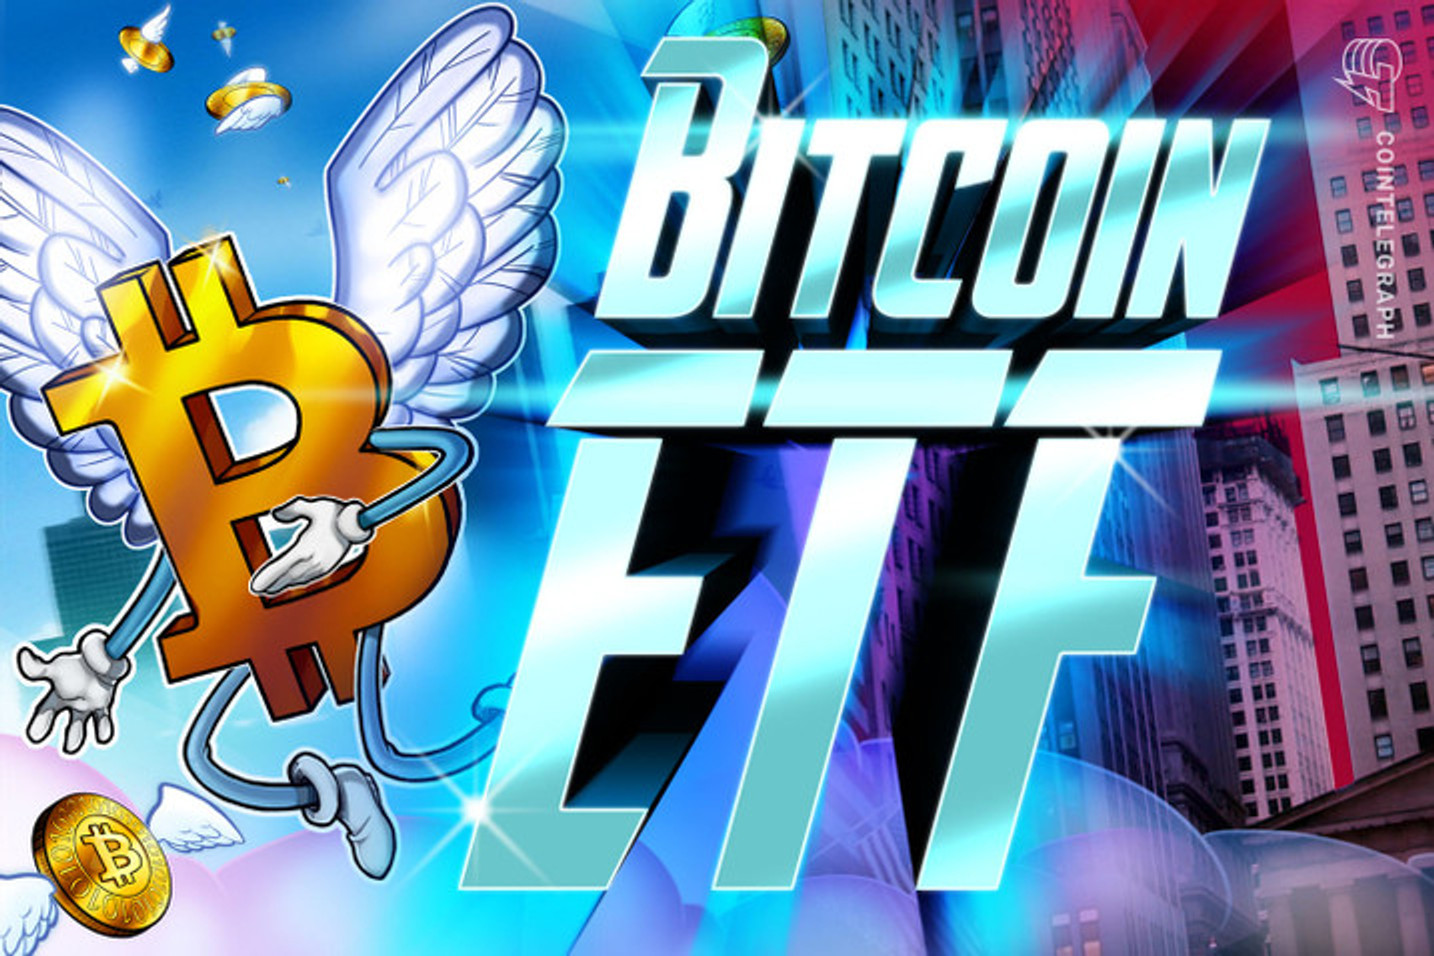 Brasileira Hashdex e Nasdaq anunciam oficialmente o início das vendas do primeiro ETF de Bitcoin do mundo